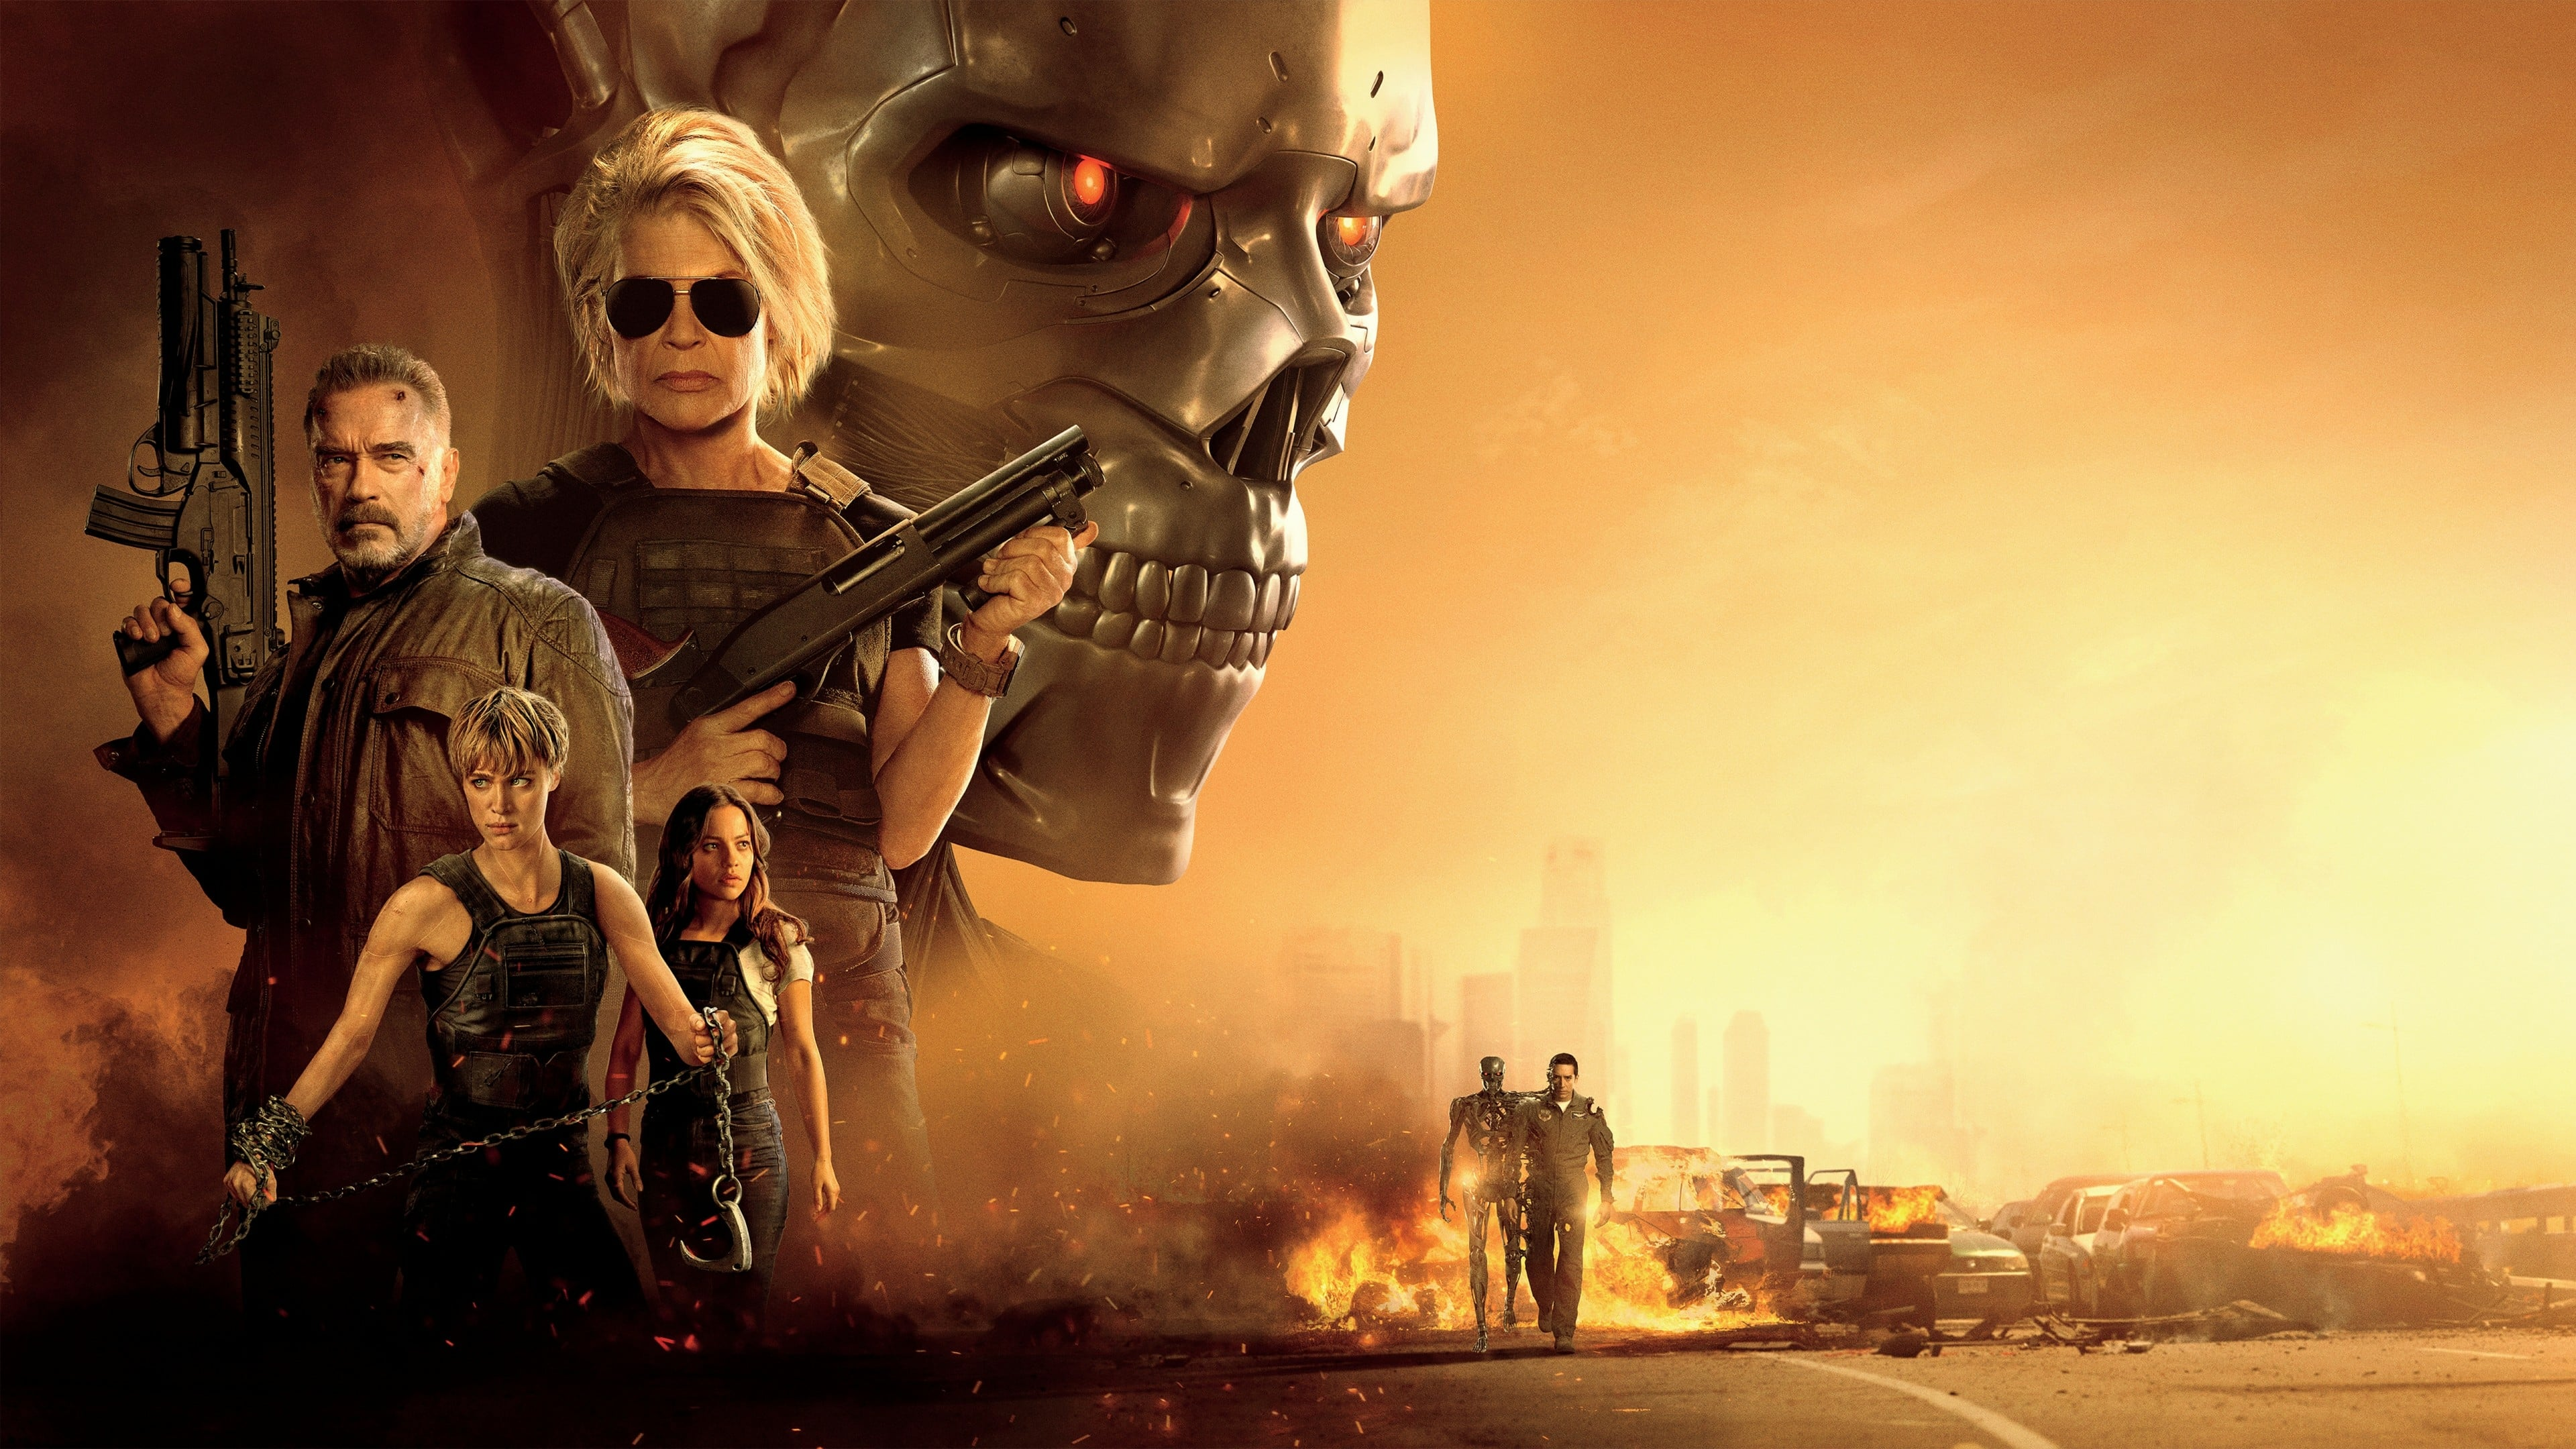 Regarder Untitled Terminator Reboot en streaming gratuit